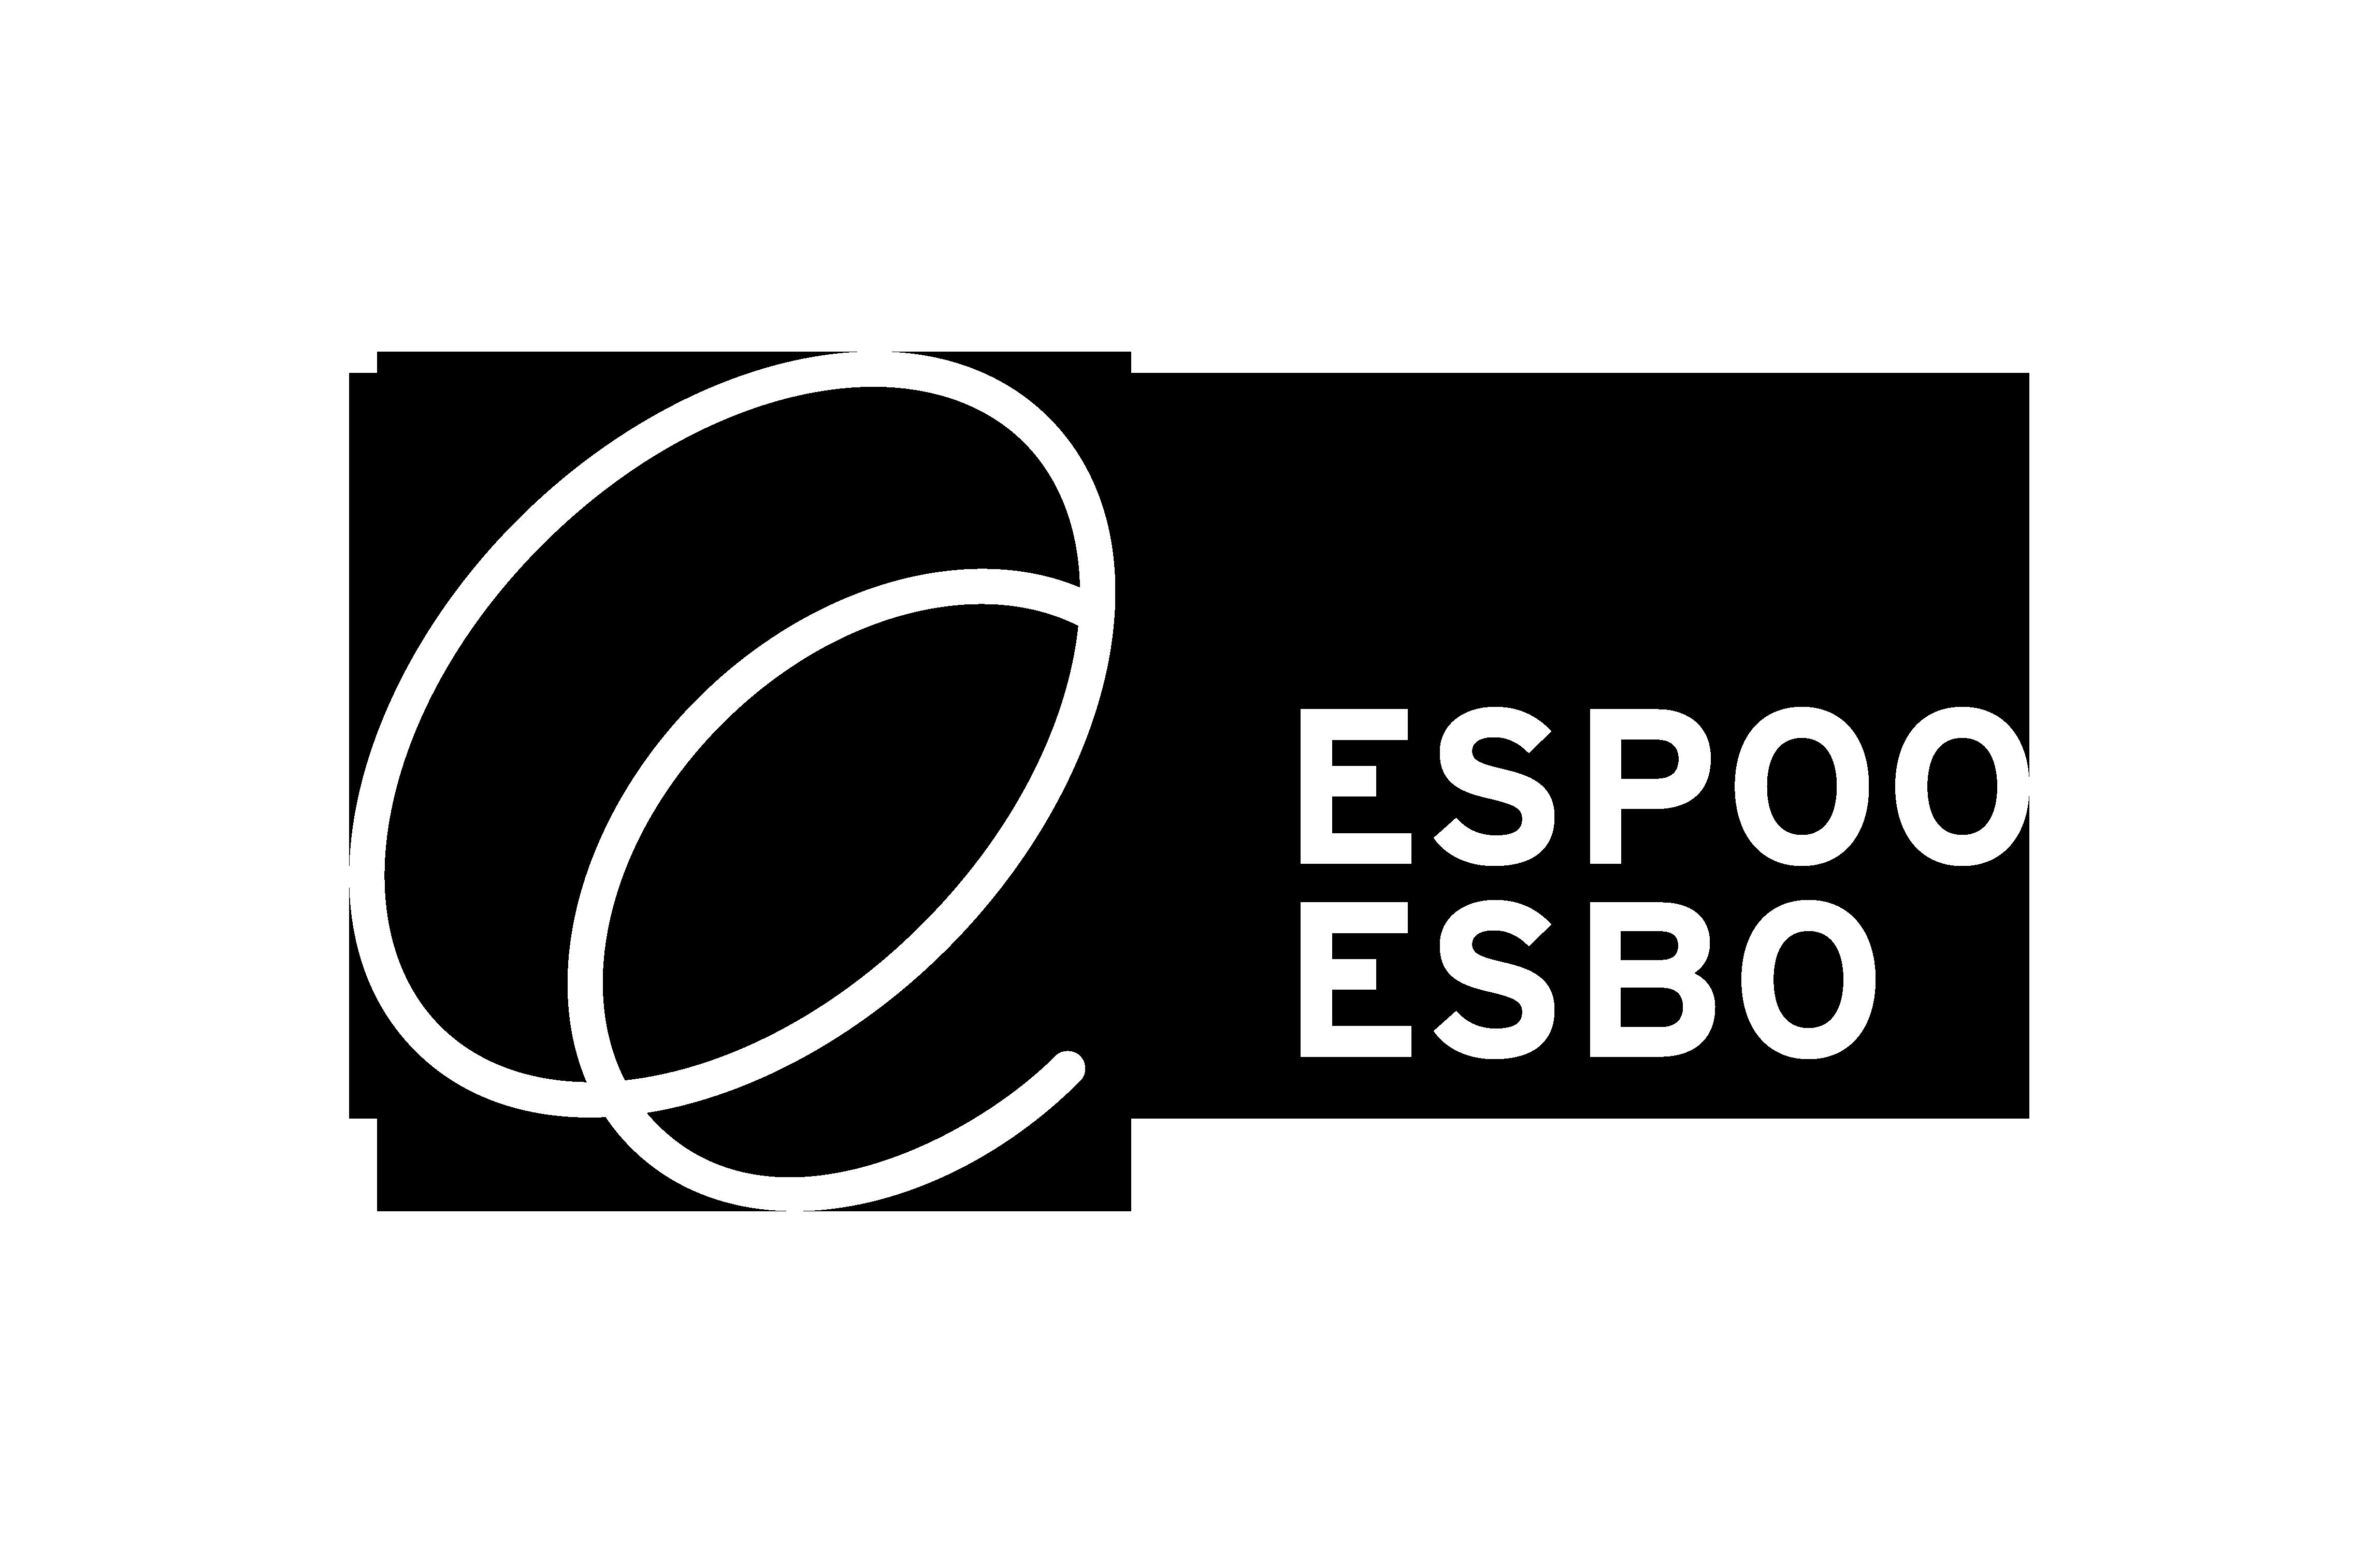 Partner logo, City of Espoo